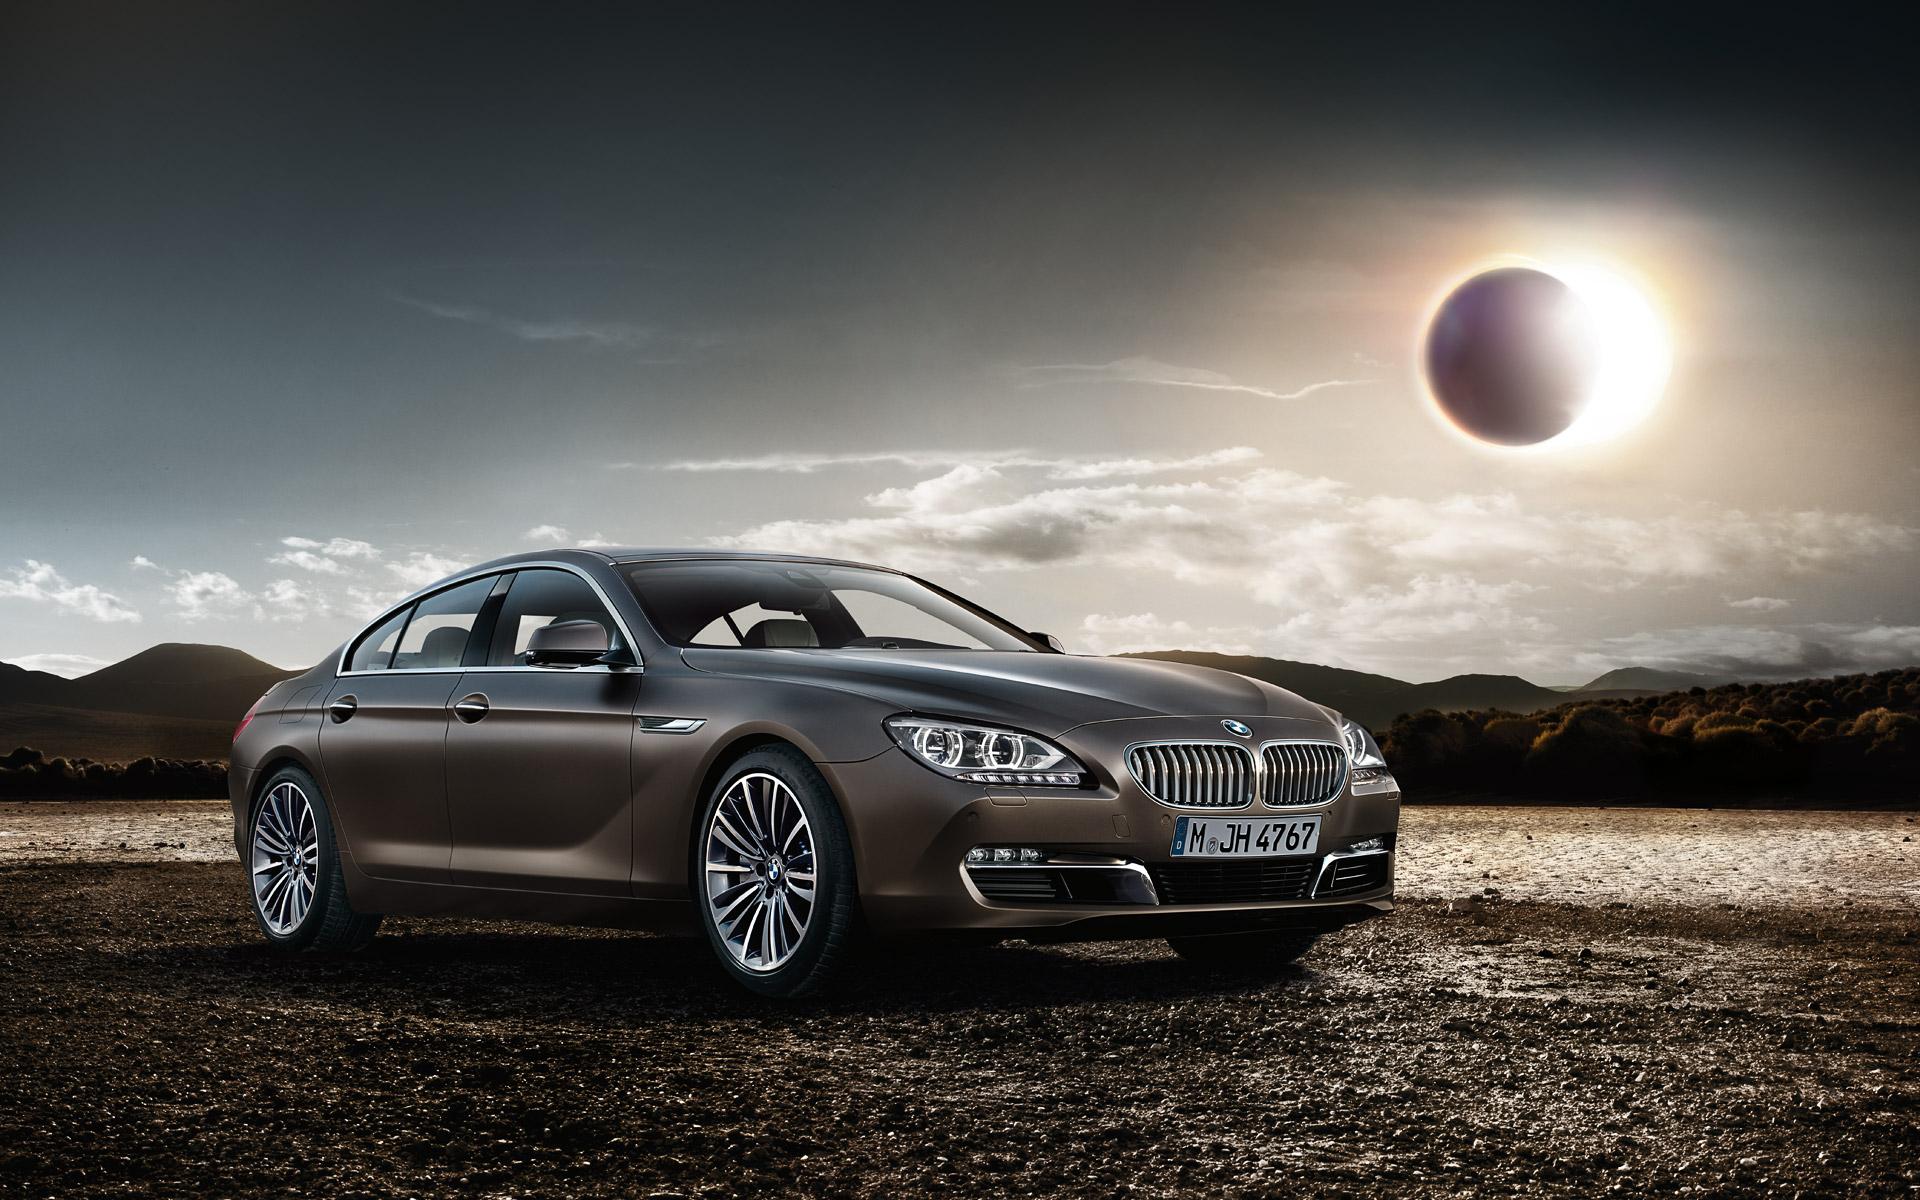 2013 BMW 6 Series Gran Coupe Wallpaper HD Car Wallpapers 1920x1200